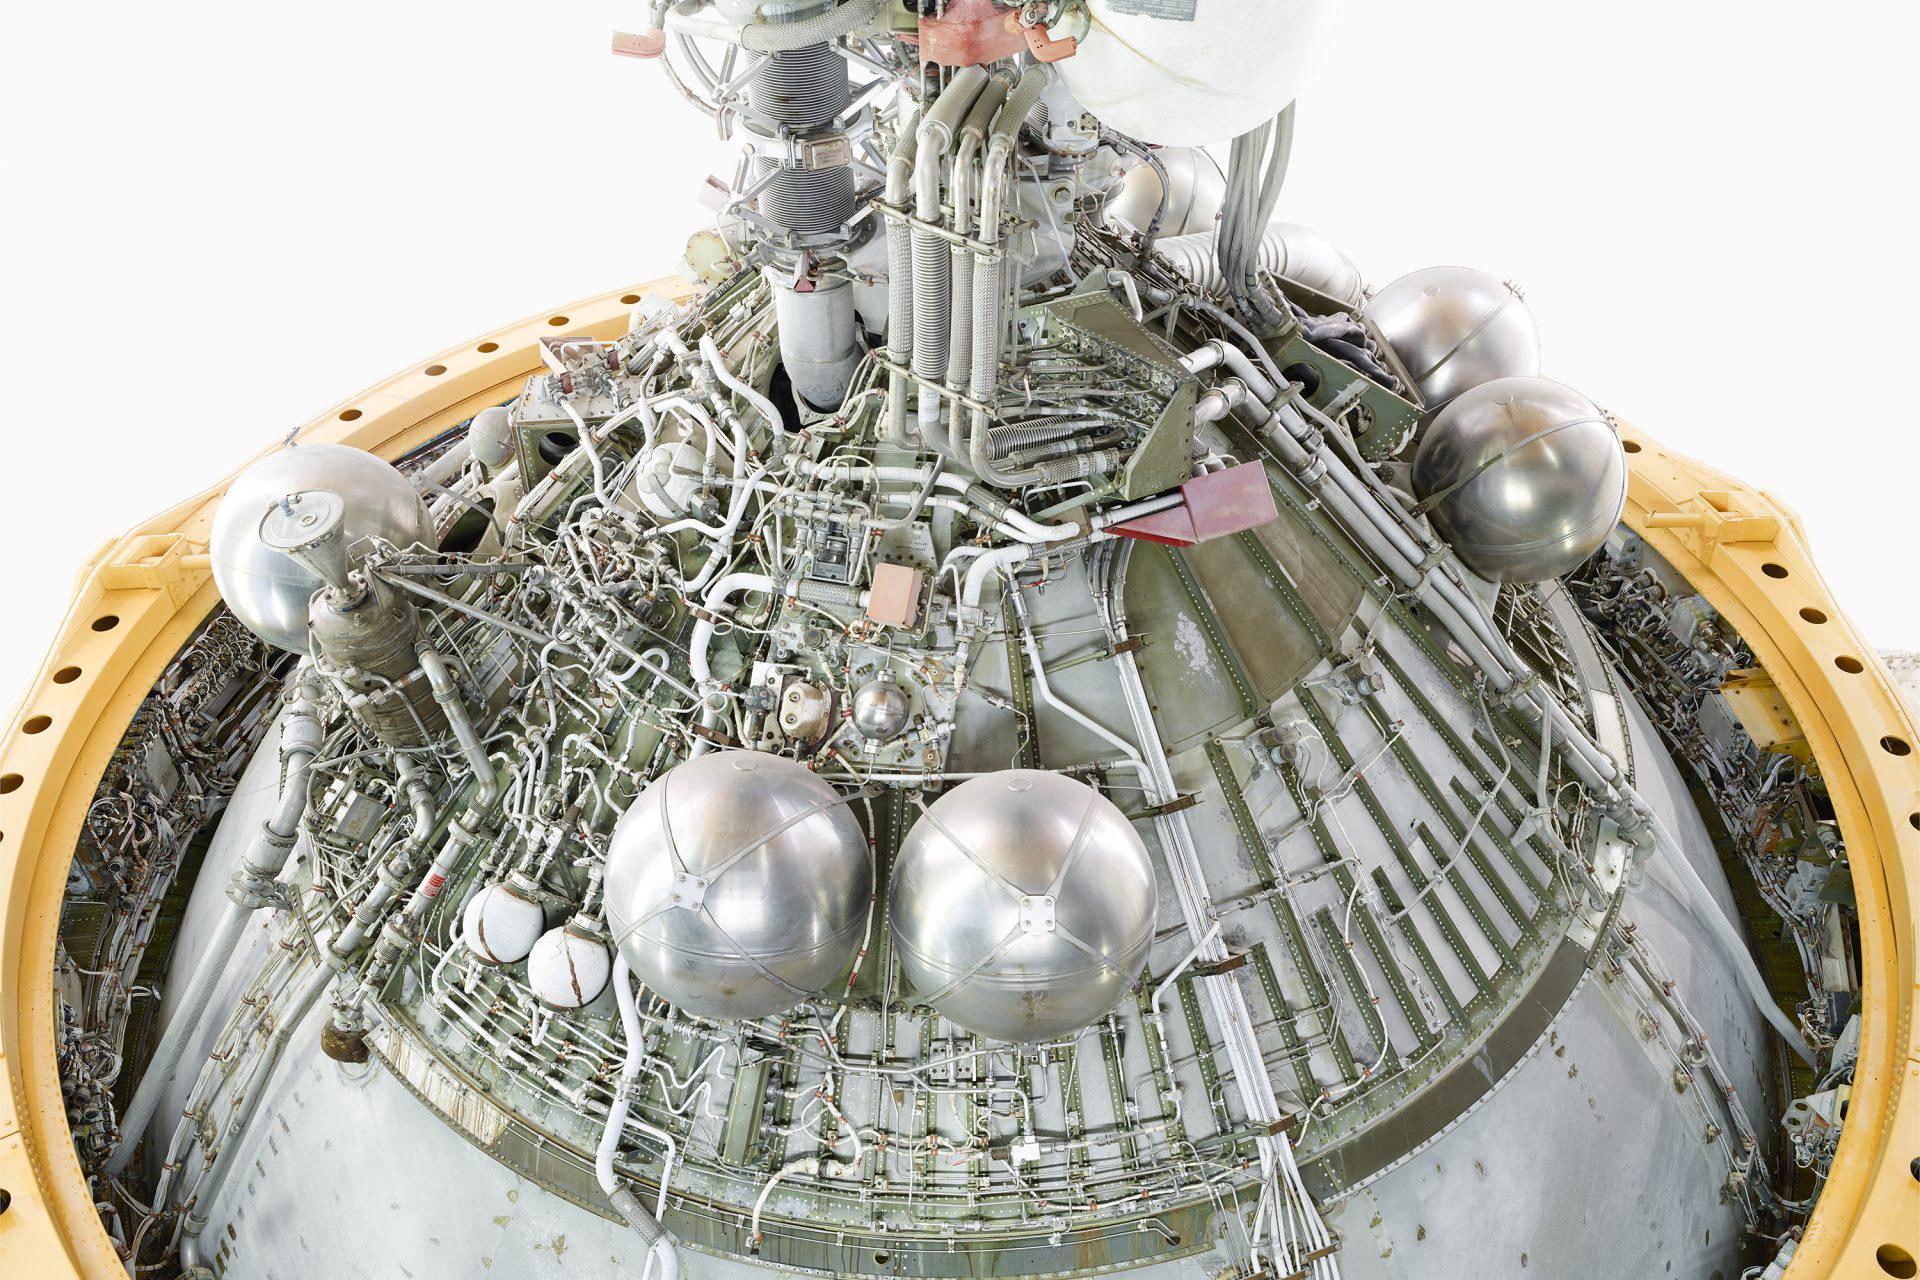 20151002_NASA_JSC_SATURN_V_Back_1-engine_Rev_A-1920x1536.jpg